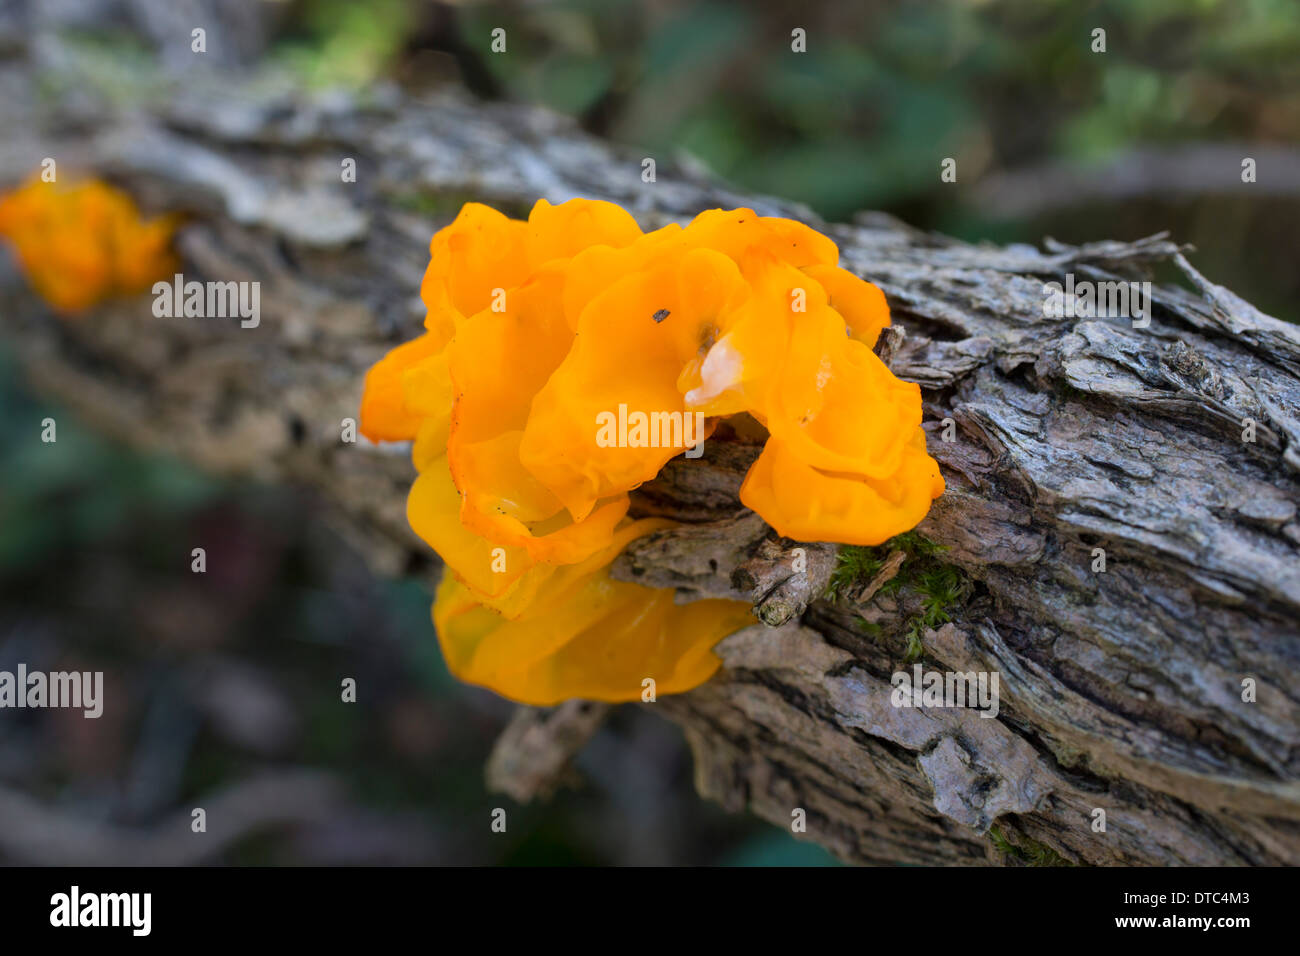 Yellow Brain Fungus; Tremella mesenterica; Autumn; UK Stock Photo